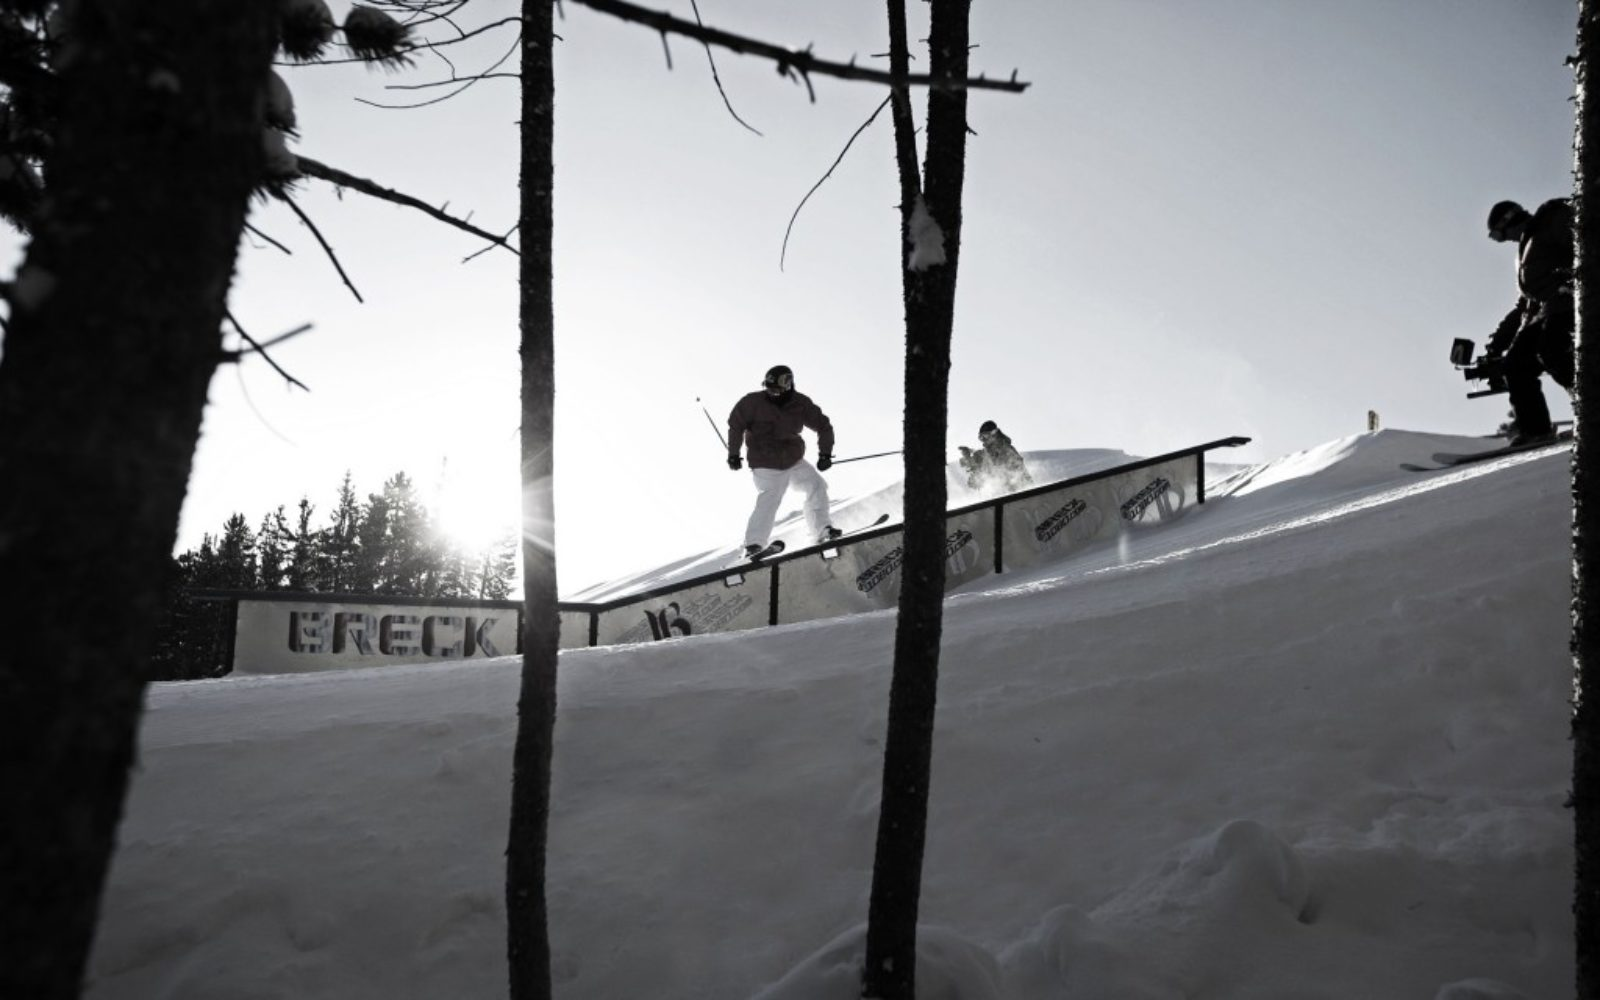 sports-xgames-skier-blackwhite2-1024x640